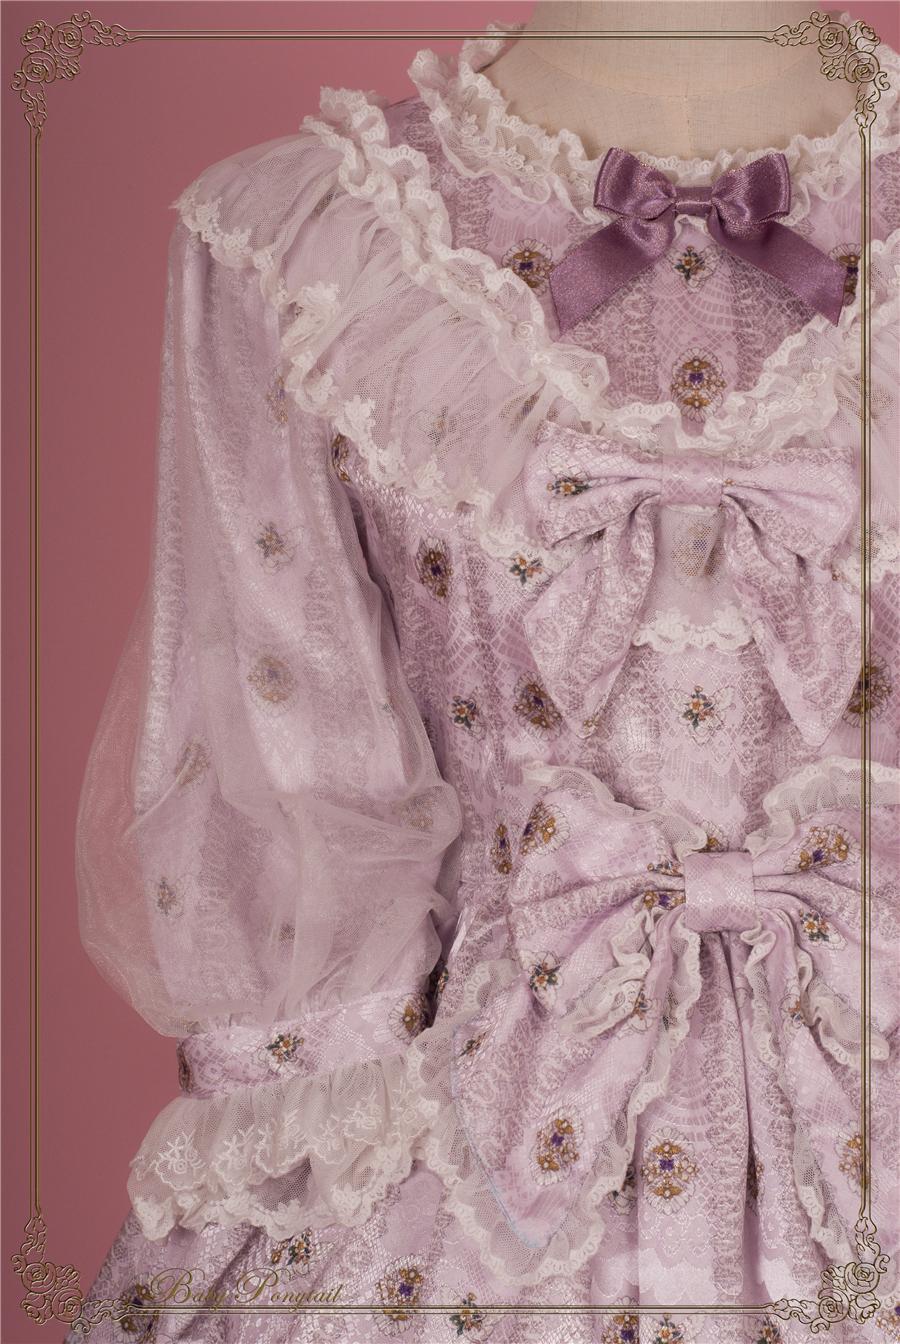 BabyPonytail_Stock Photo_My Favorite Companion_OP Lavender_03.jpg